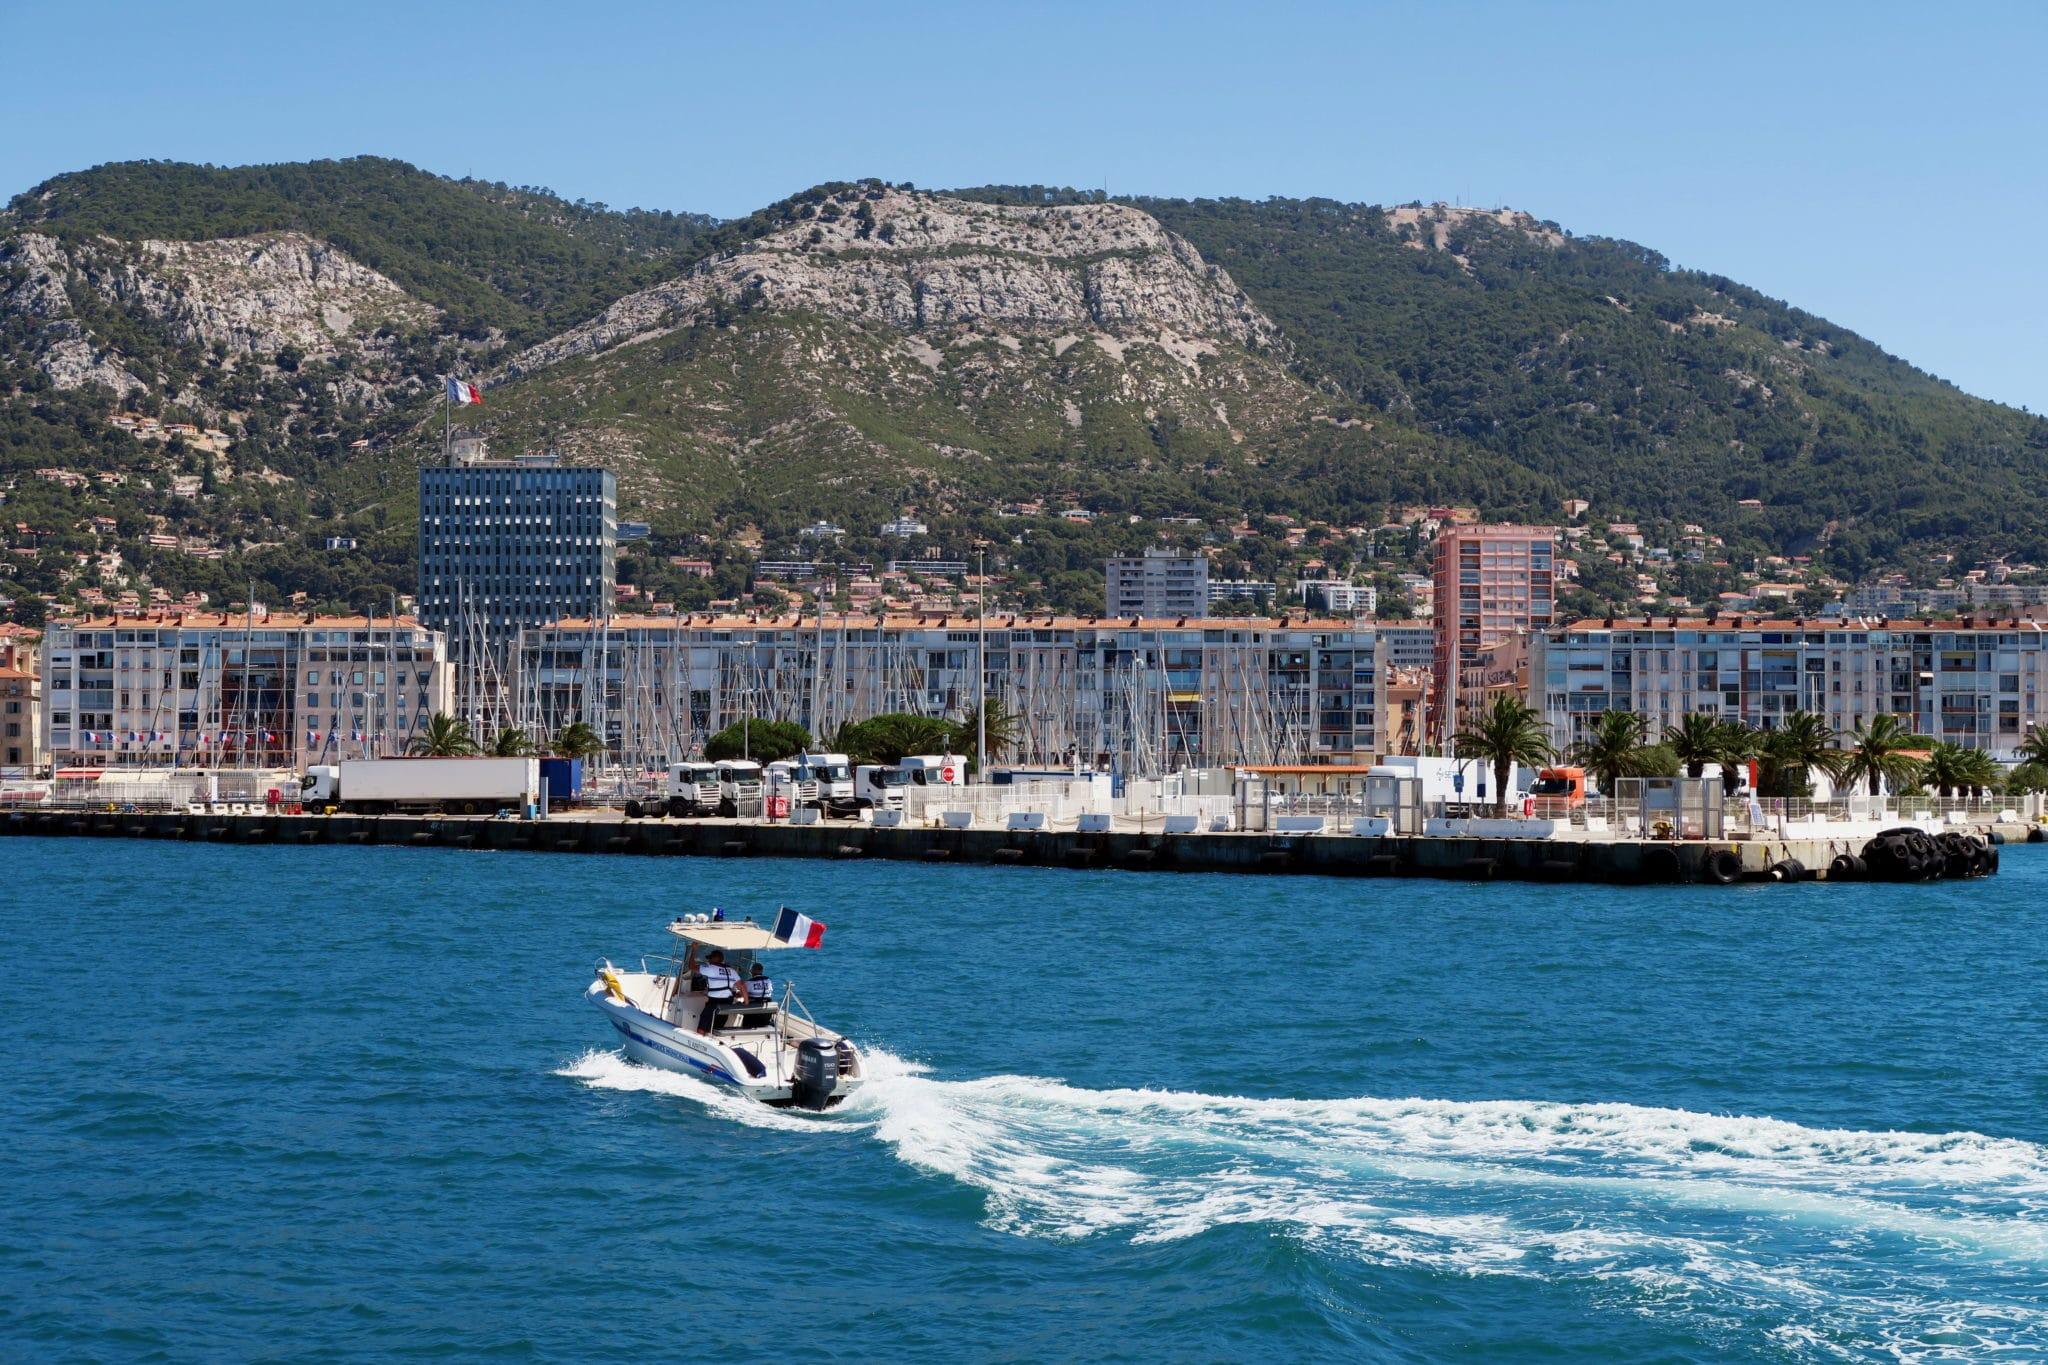 Rade de Toulon - Toulon Bay